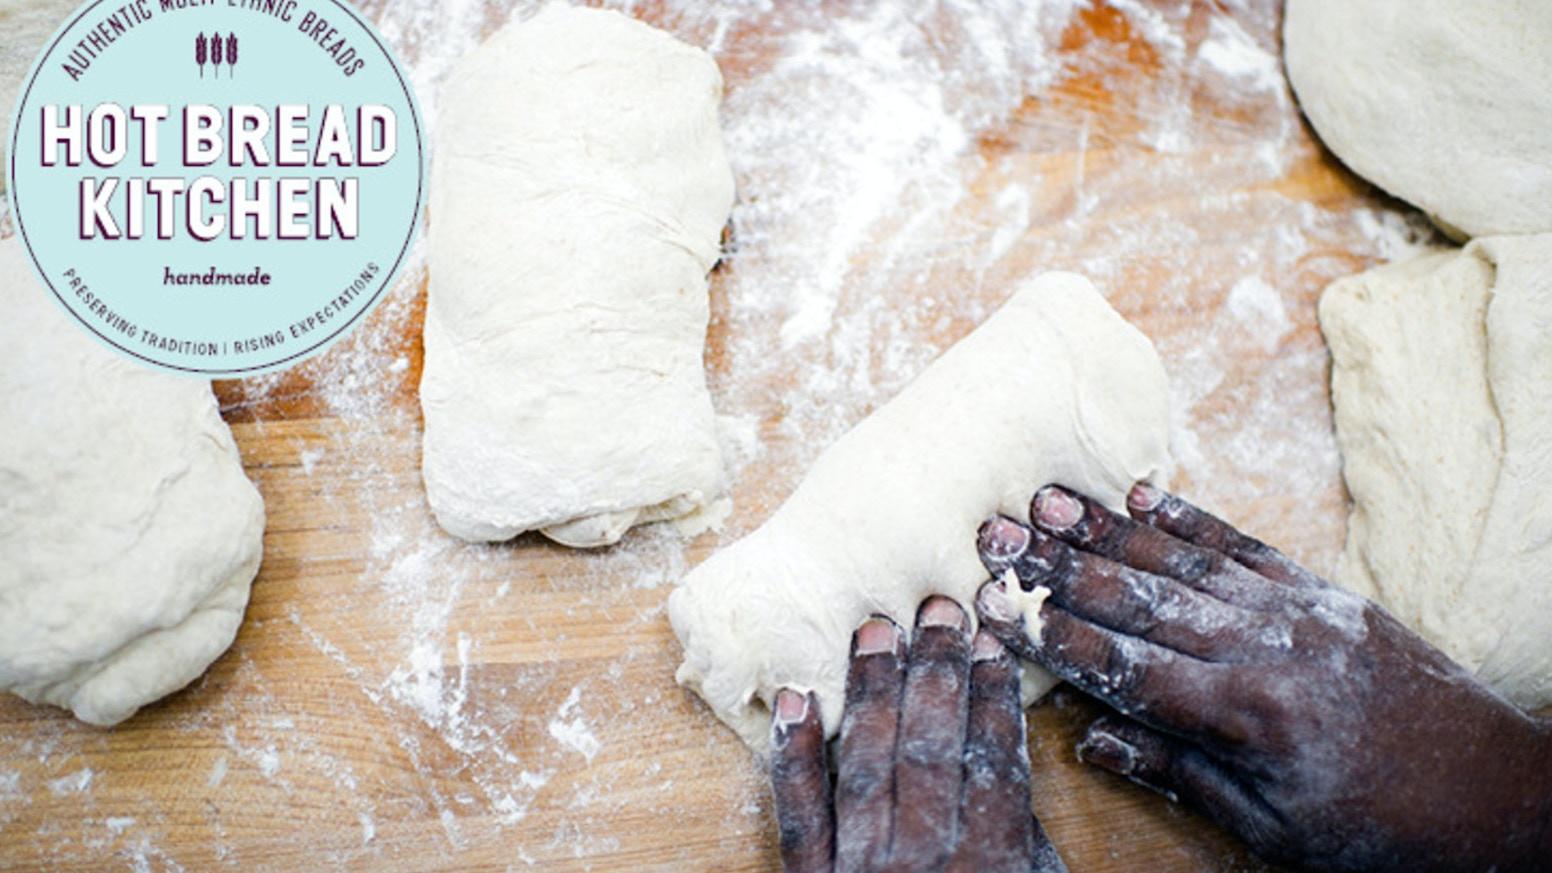 Hot Bread Kitchen: Women Bake Bread by Hot Bread Kitchen — Kickstarter